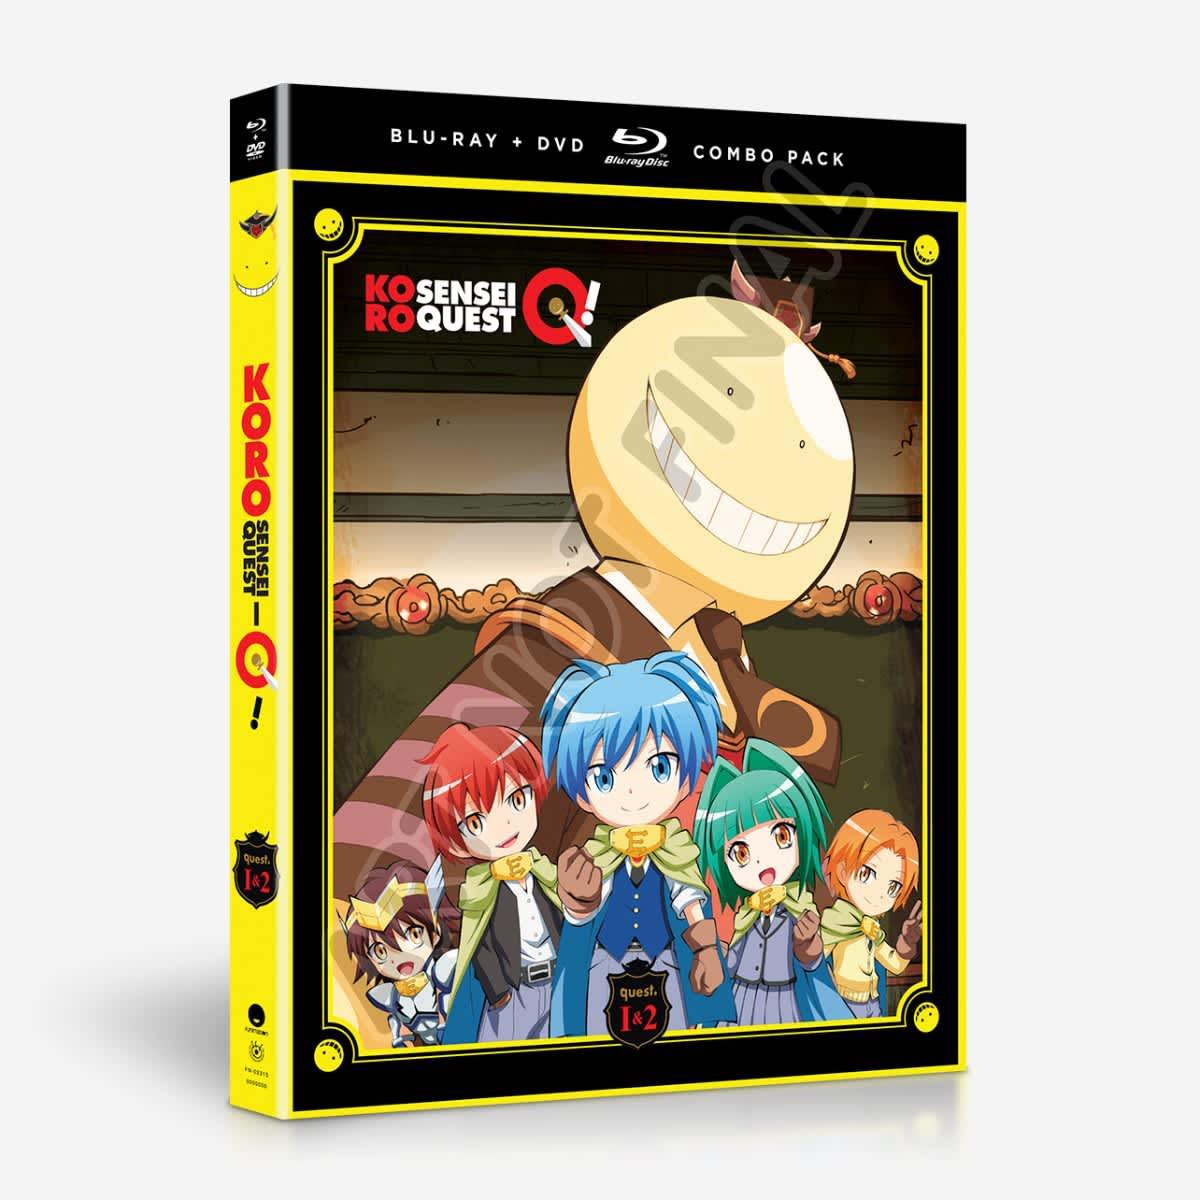 Shorts - BD/DVD Combo home-video